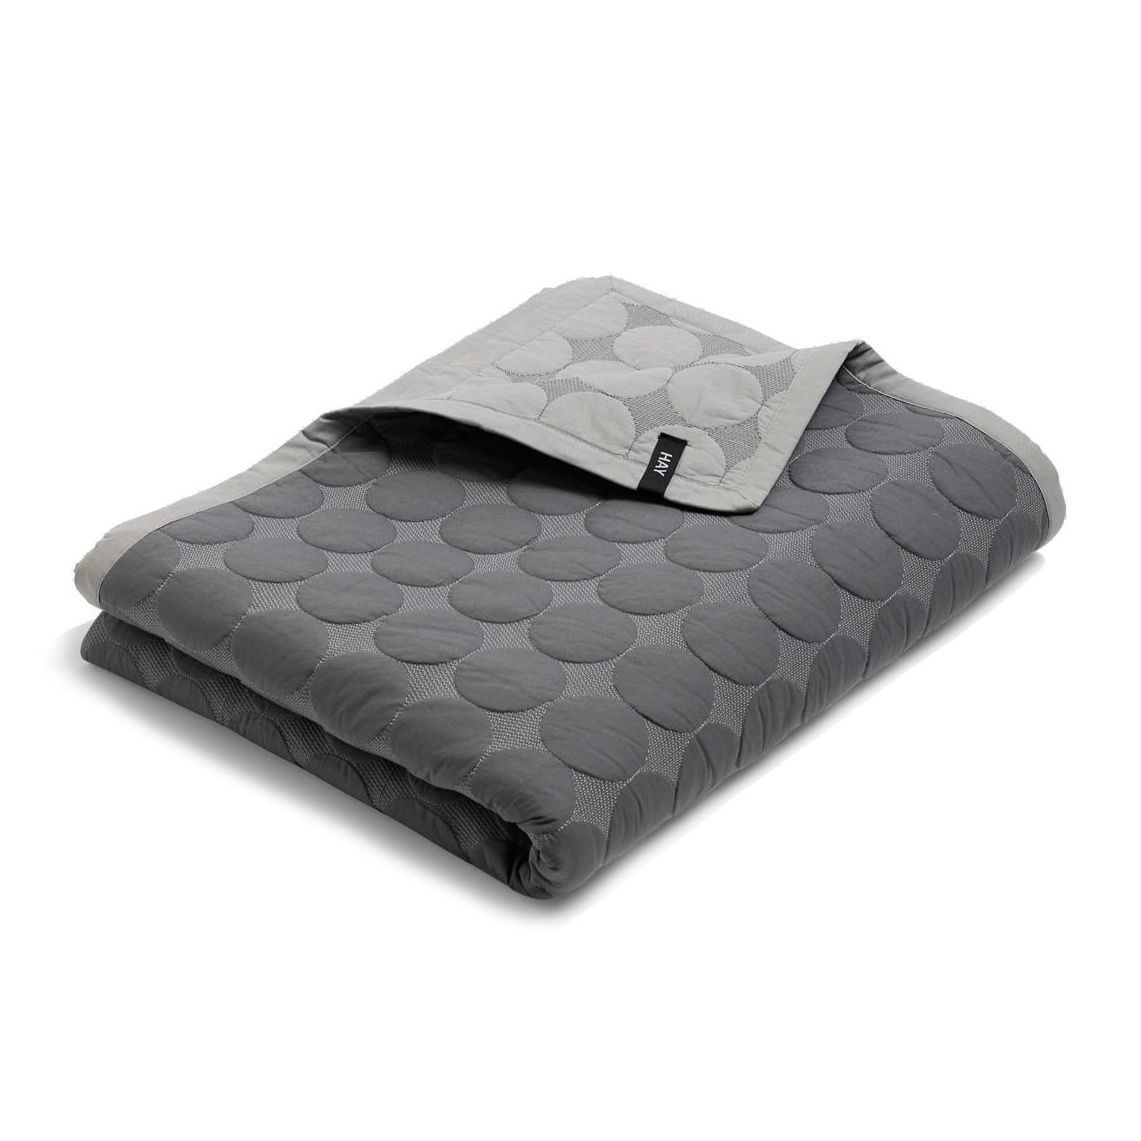 hay mega dot quilt tagesdecke dunkelgrau 235x245cm. Black Bedroom Furniture Sets. Home Design Ideas